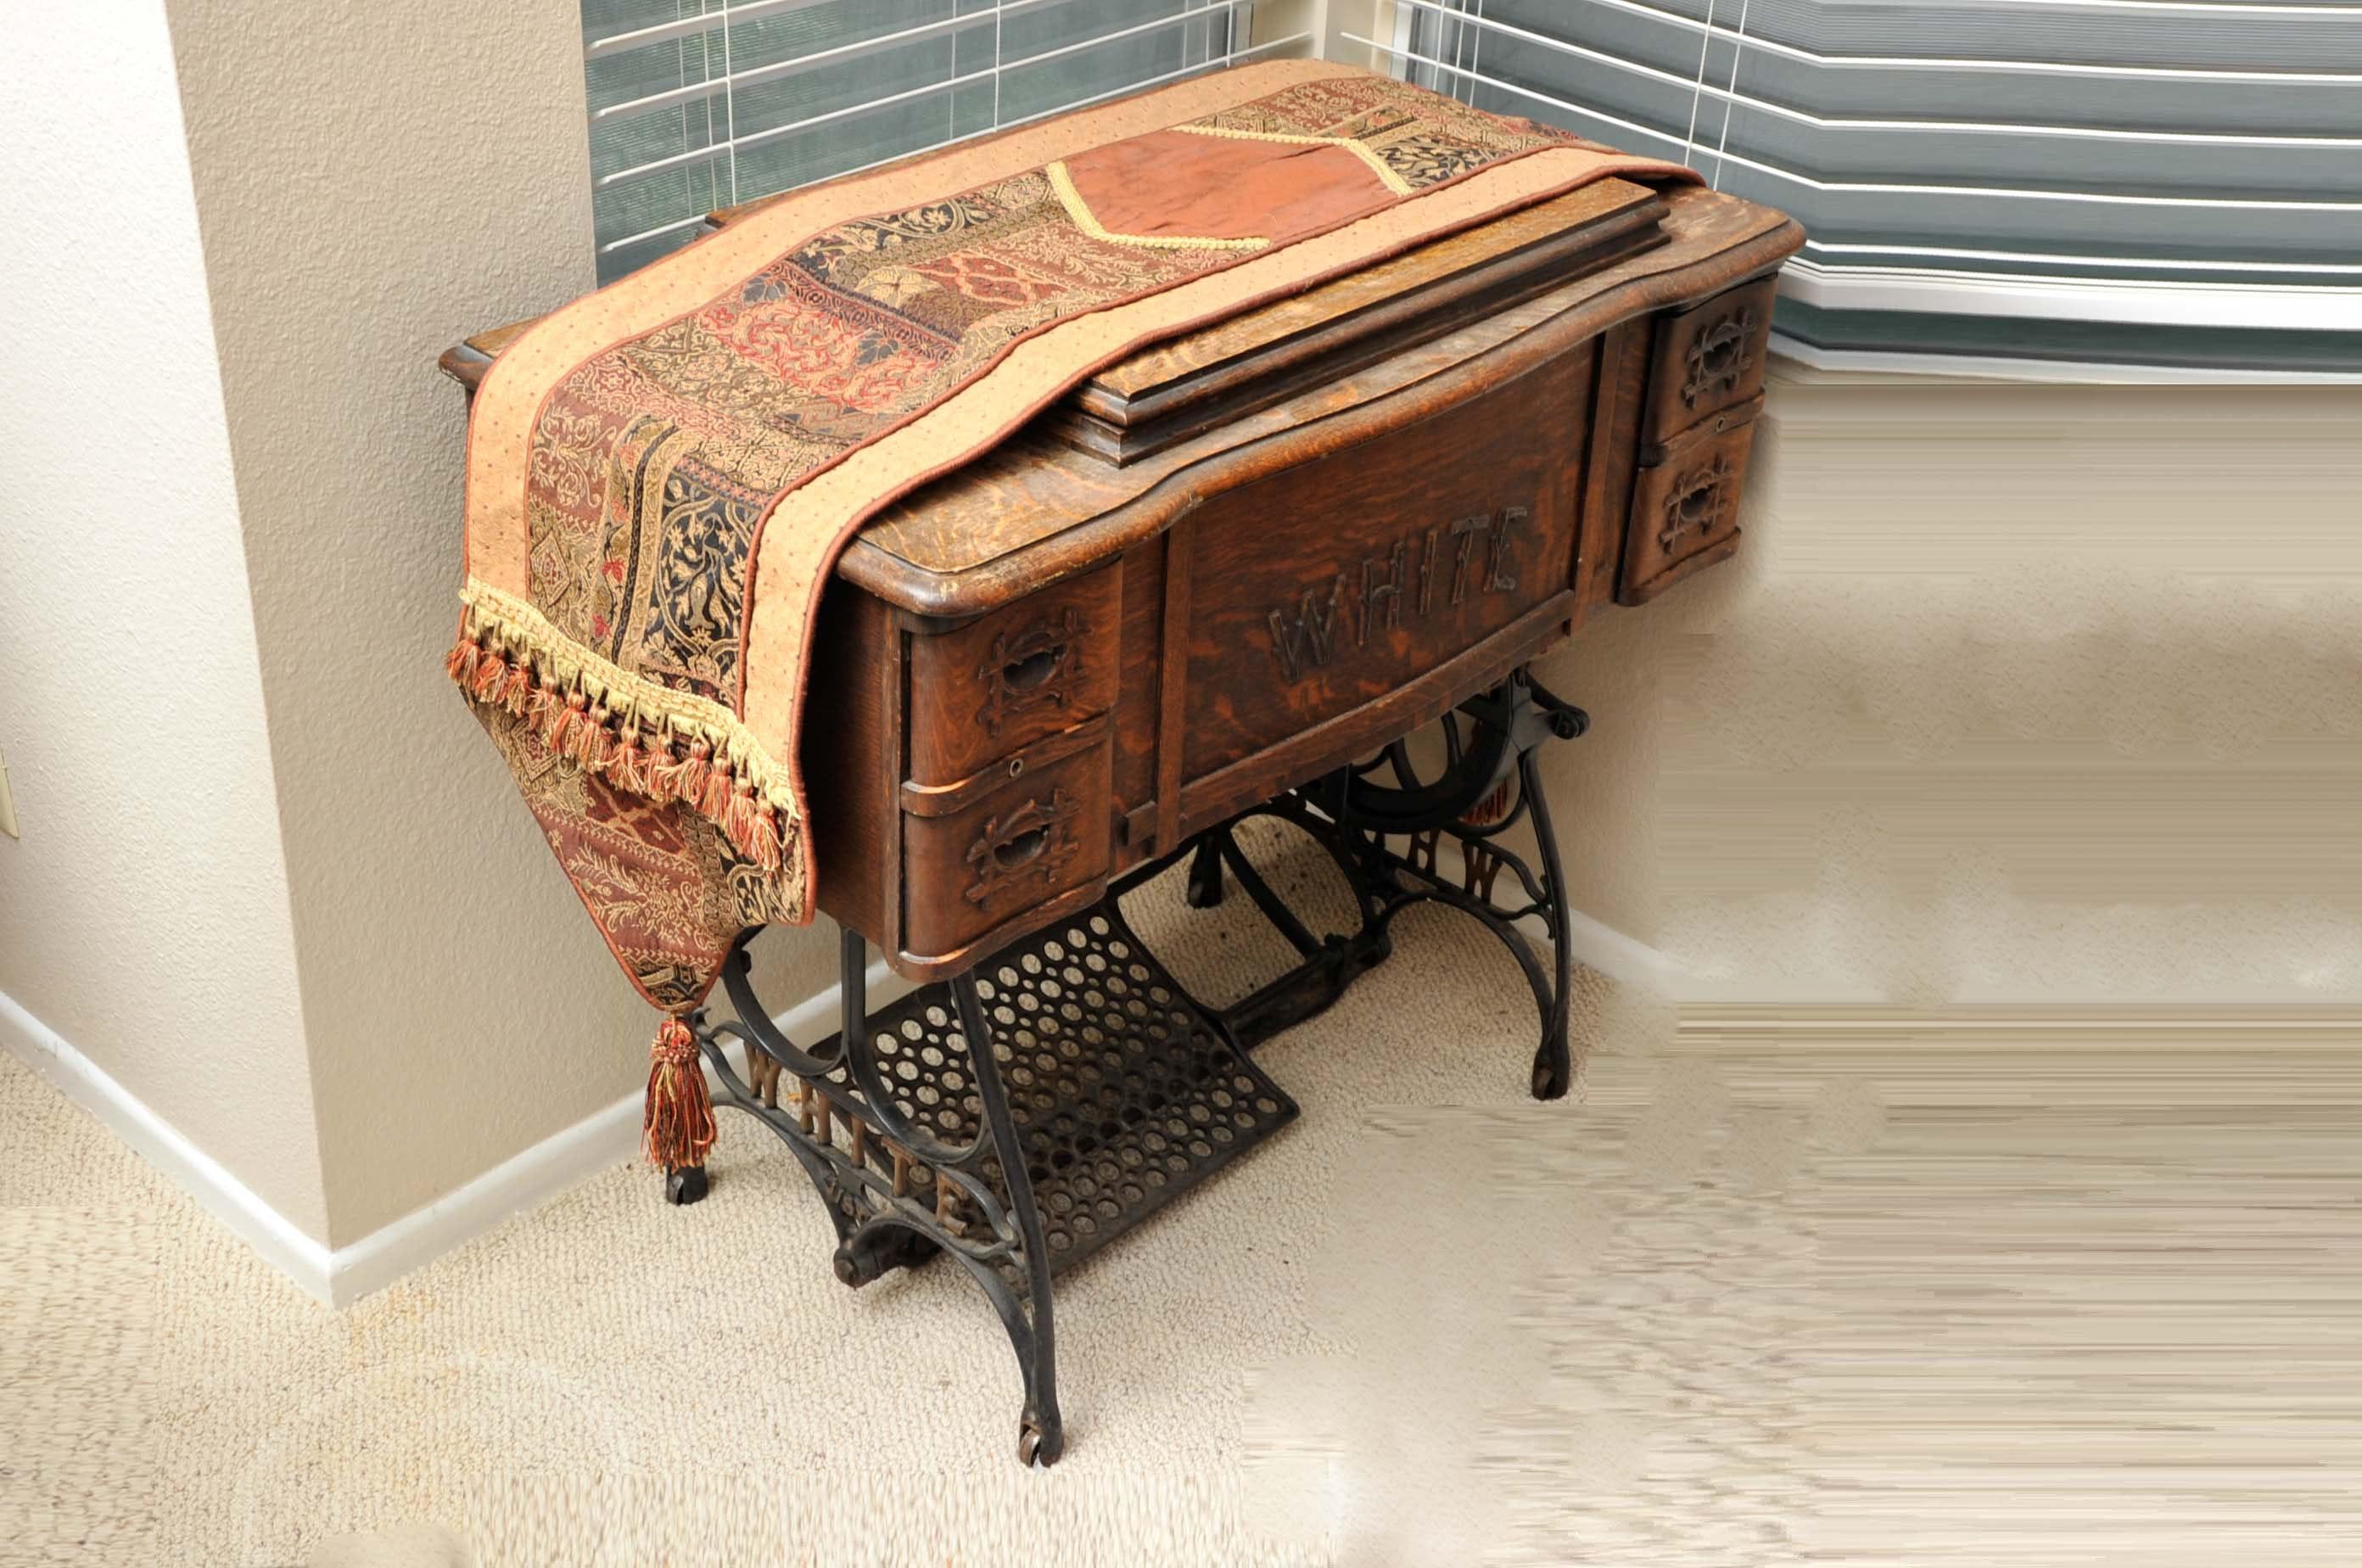 Antique Treadle Sewing Machine and Quarter Sawn Oak Cabinet